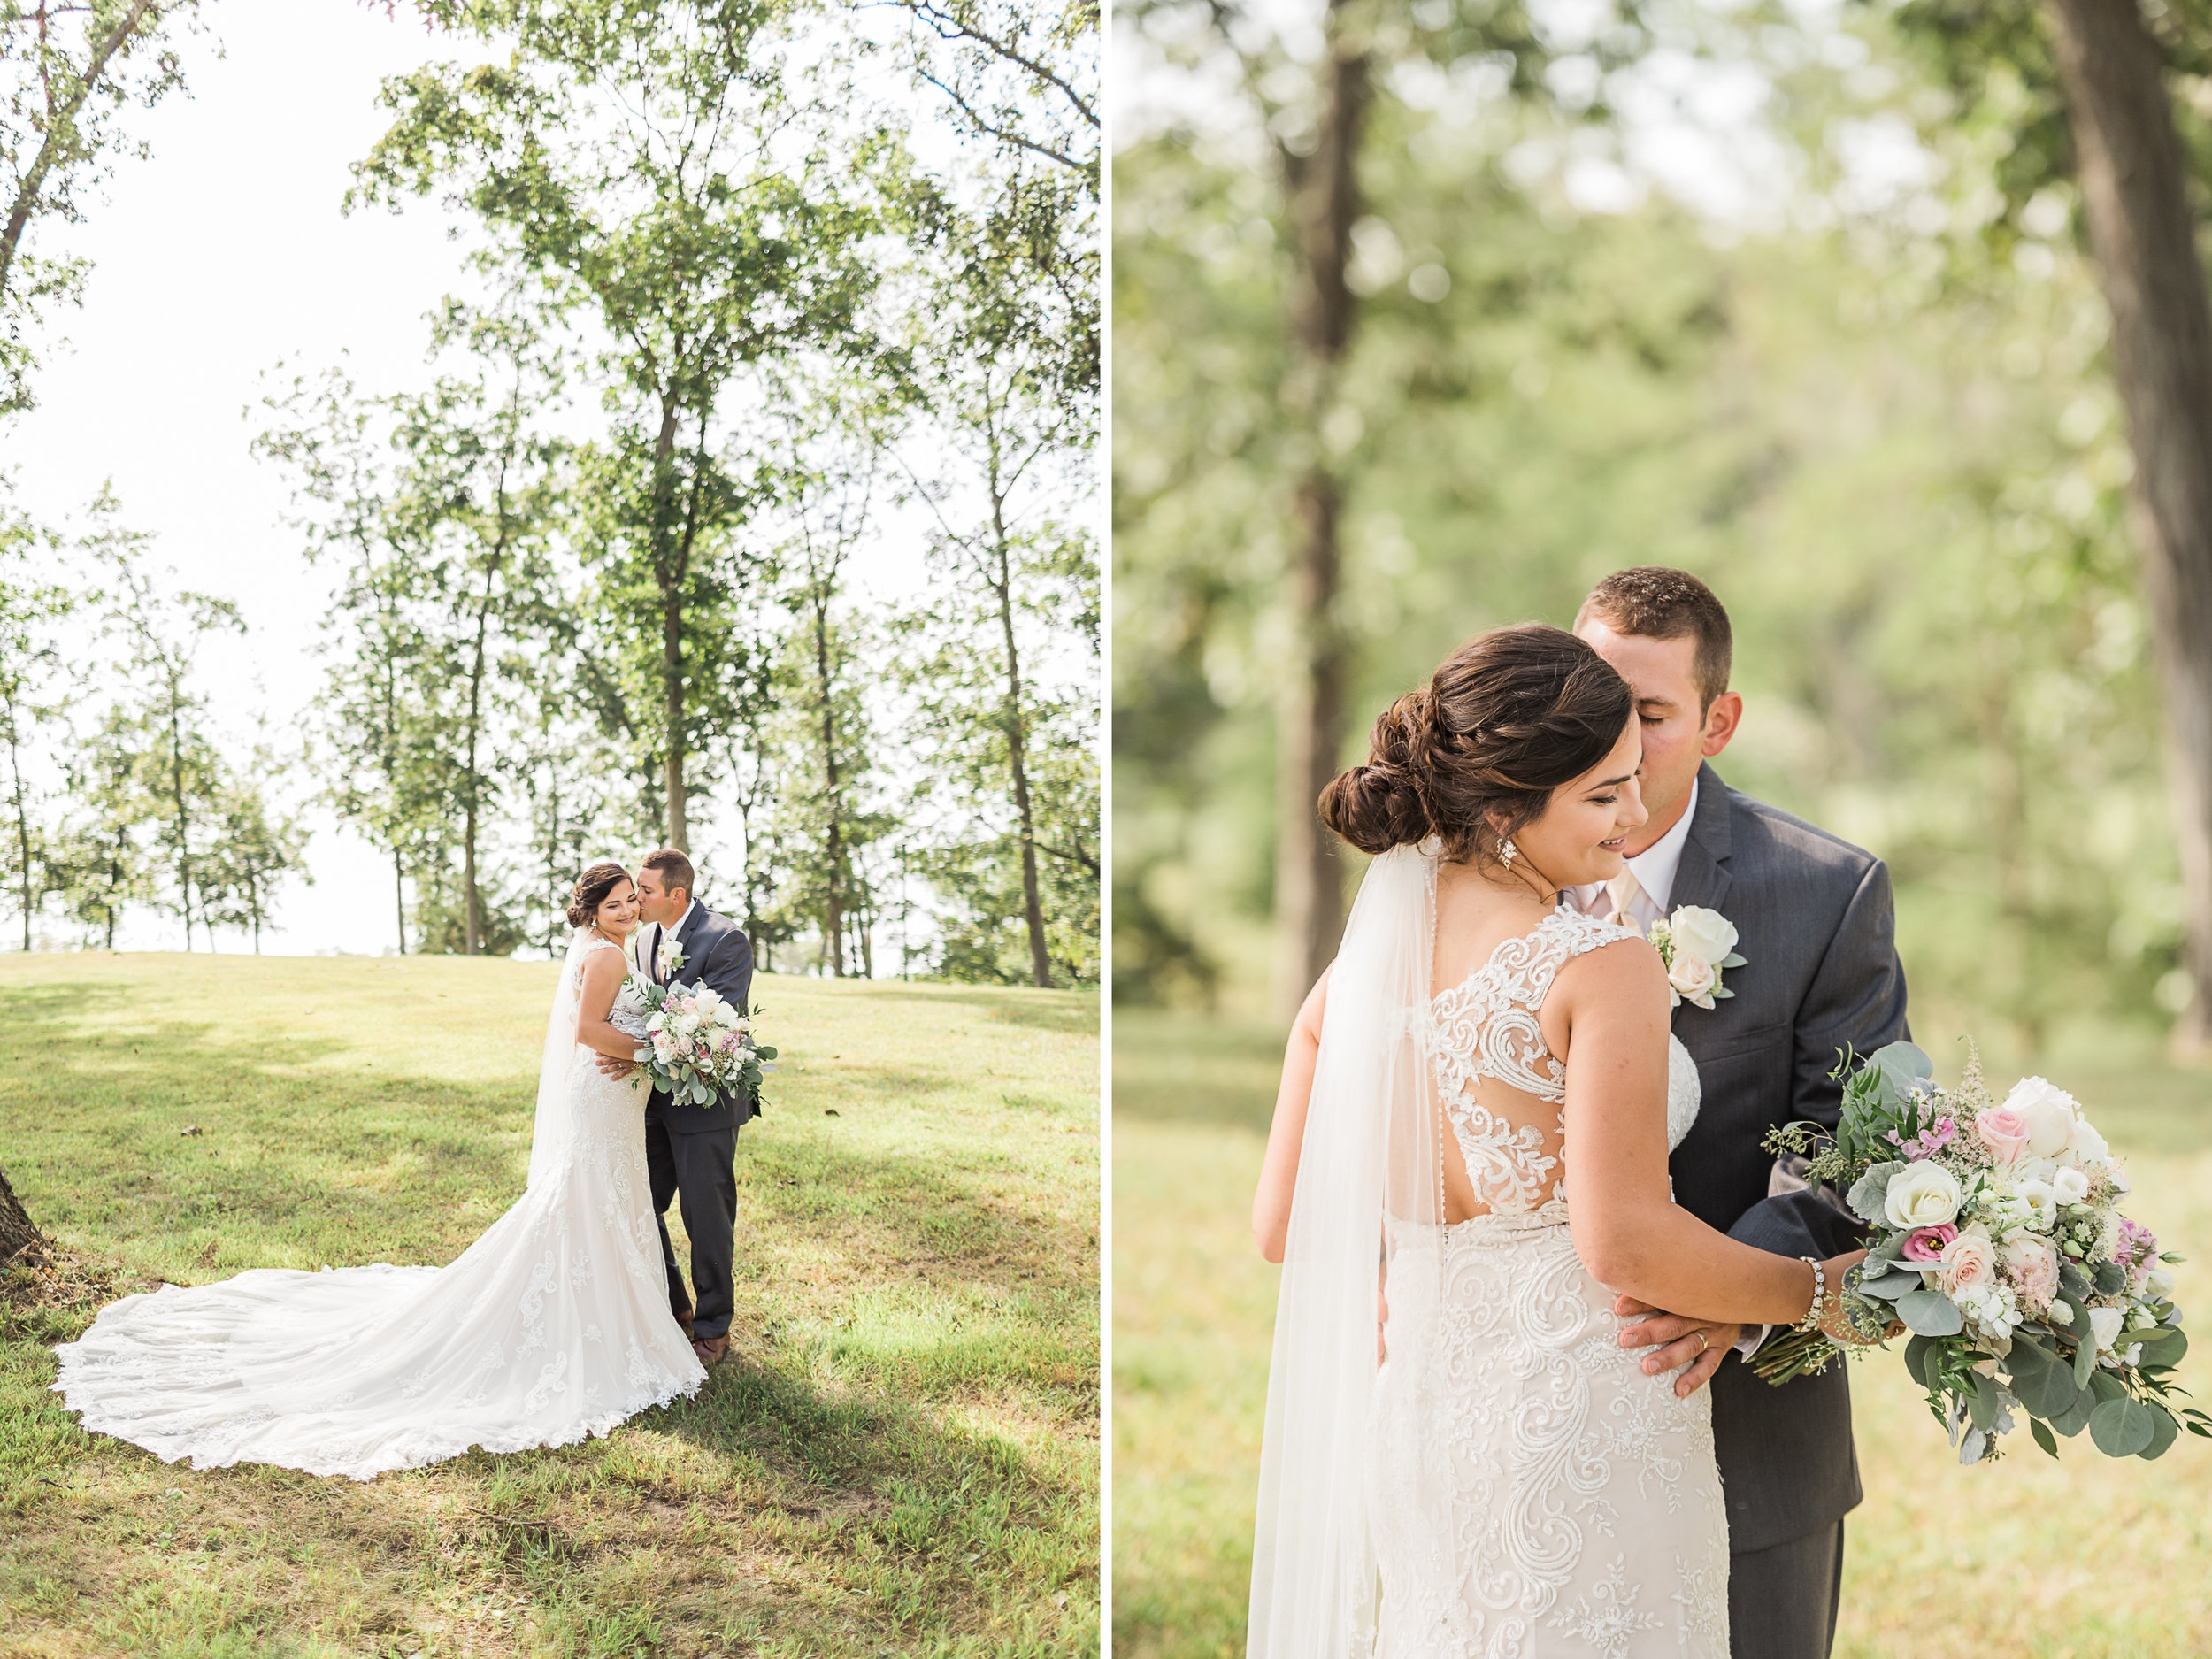 romanticcountrywedding-9.jpg